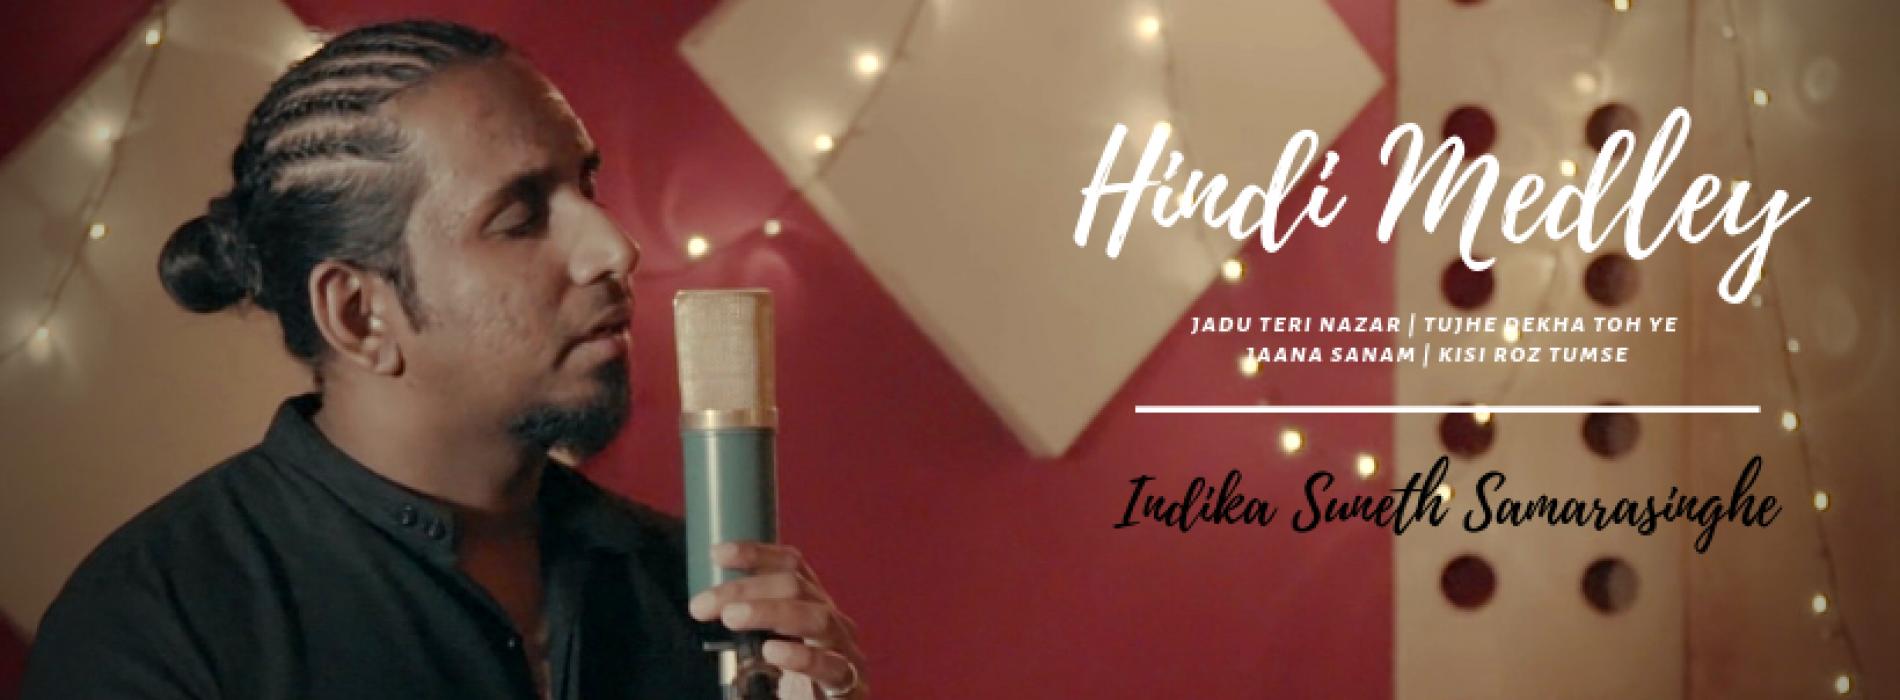 Jadu Teri Nazar | Tujhe Dekha Toh Ye | Kisi Roz Tumse (Hindi Medley Cover) Performed By Indika Suneth Samarasinghe